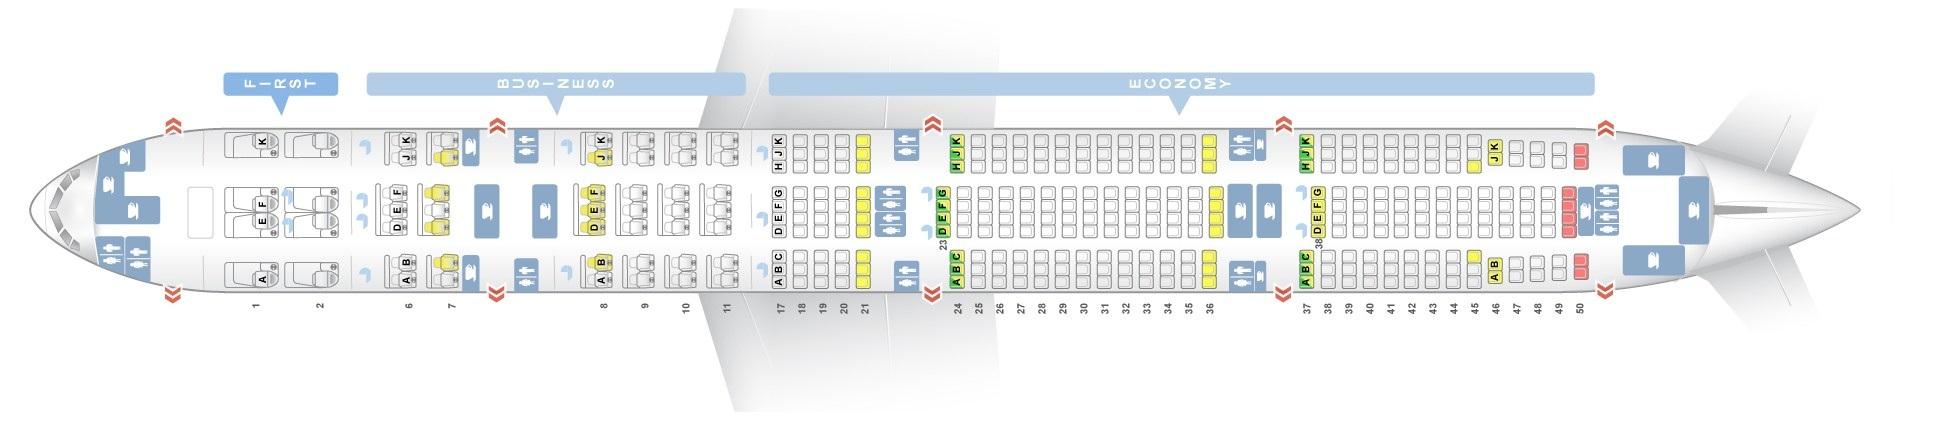 Emirates_Airlines_Boeing_777-300_2